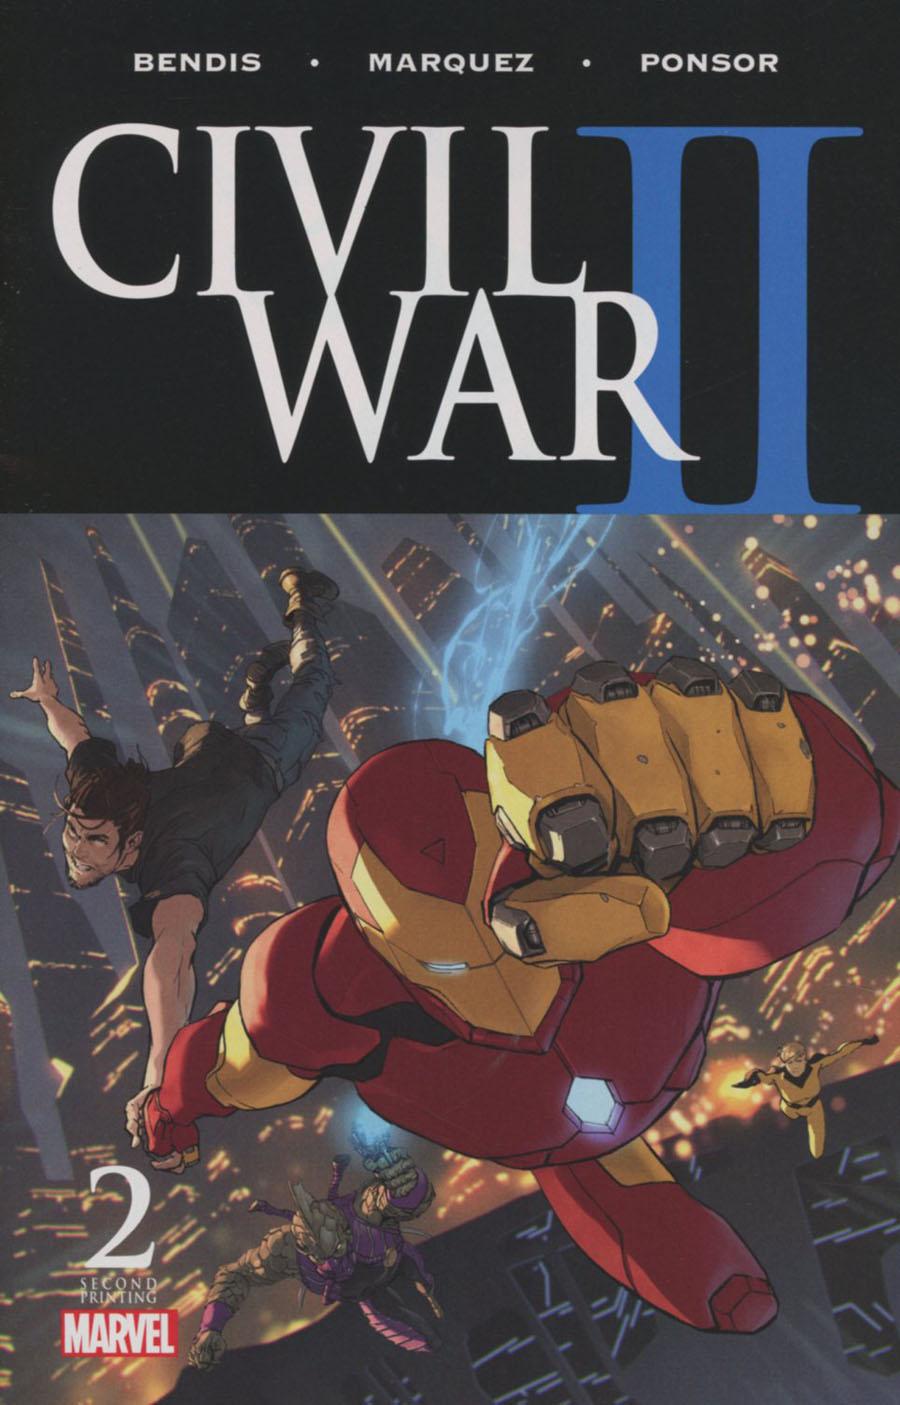 Civil War II #2 Cover F 2nd Ptg Marko Djurdjevic Variant Cover